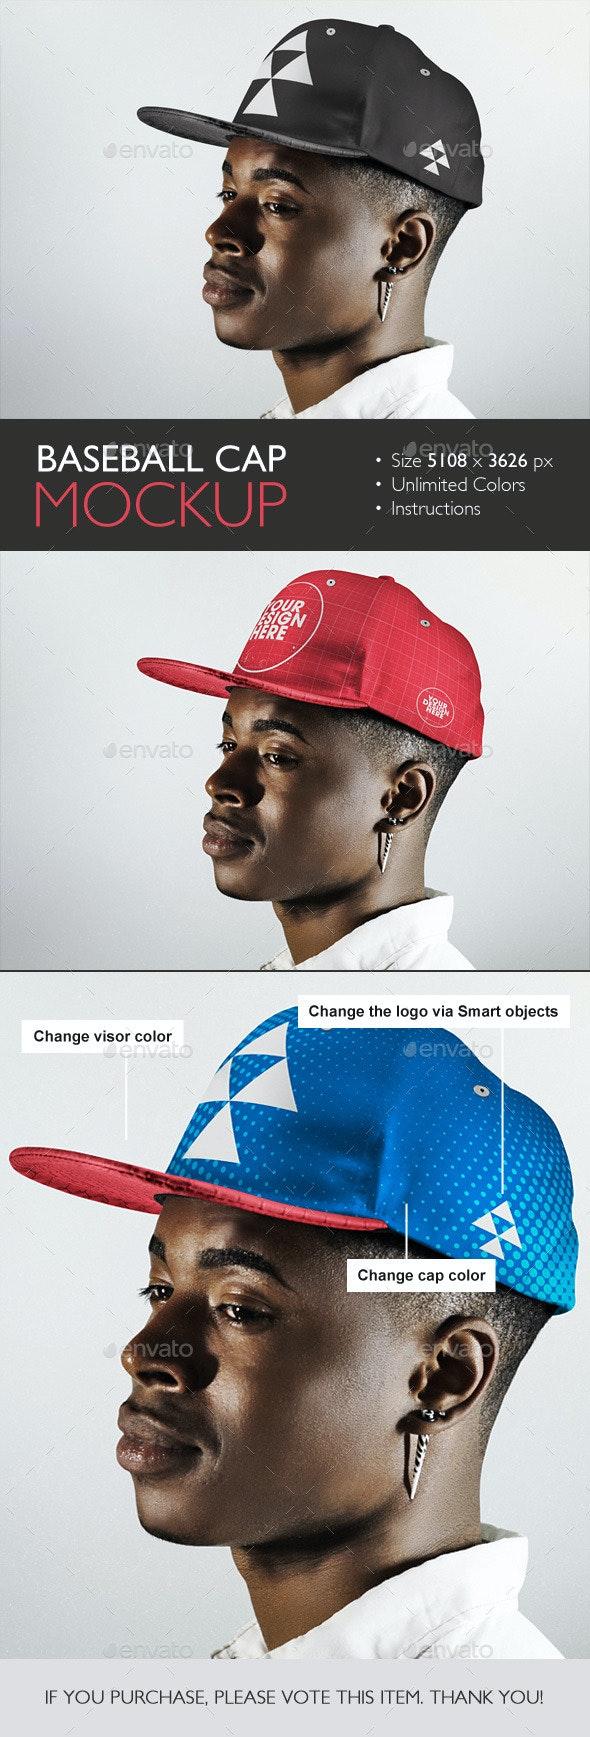 Baseball Cap Mockup - Product Mock-Ups Graphics